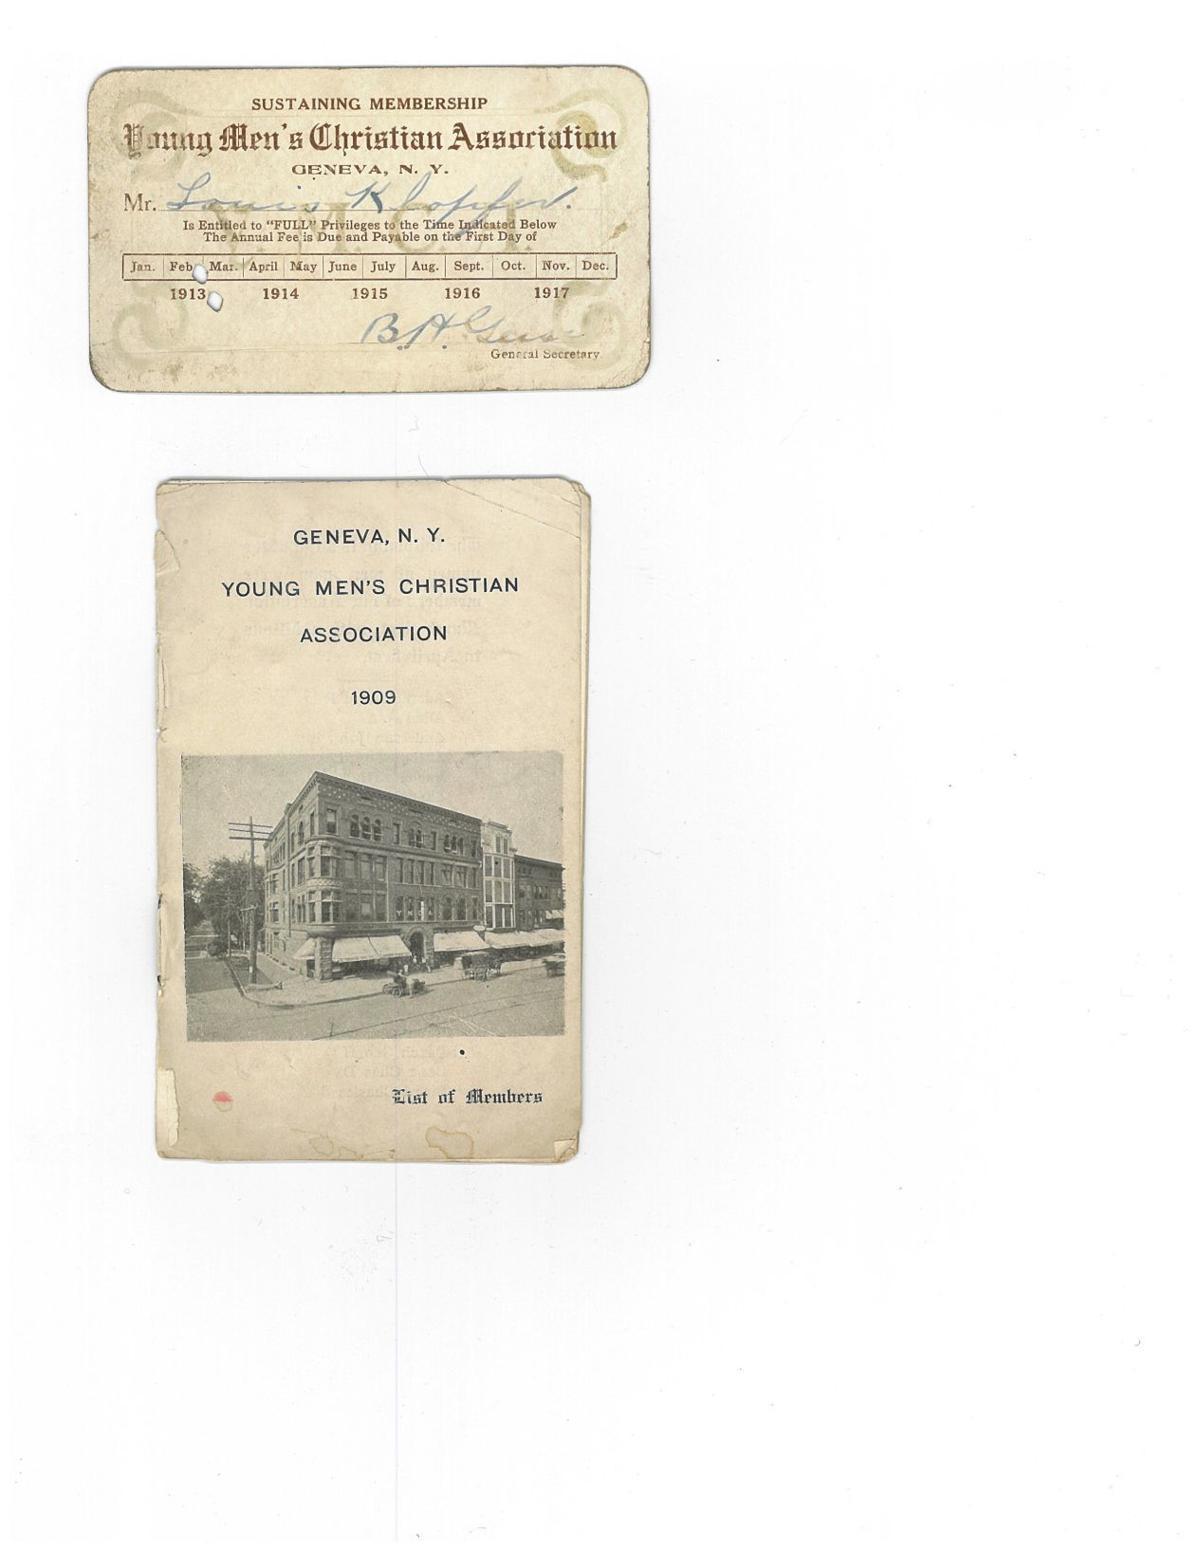 Geneva YMCA history